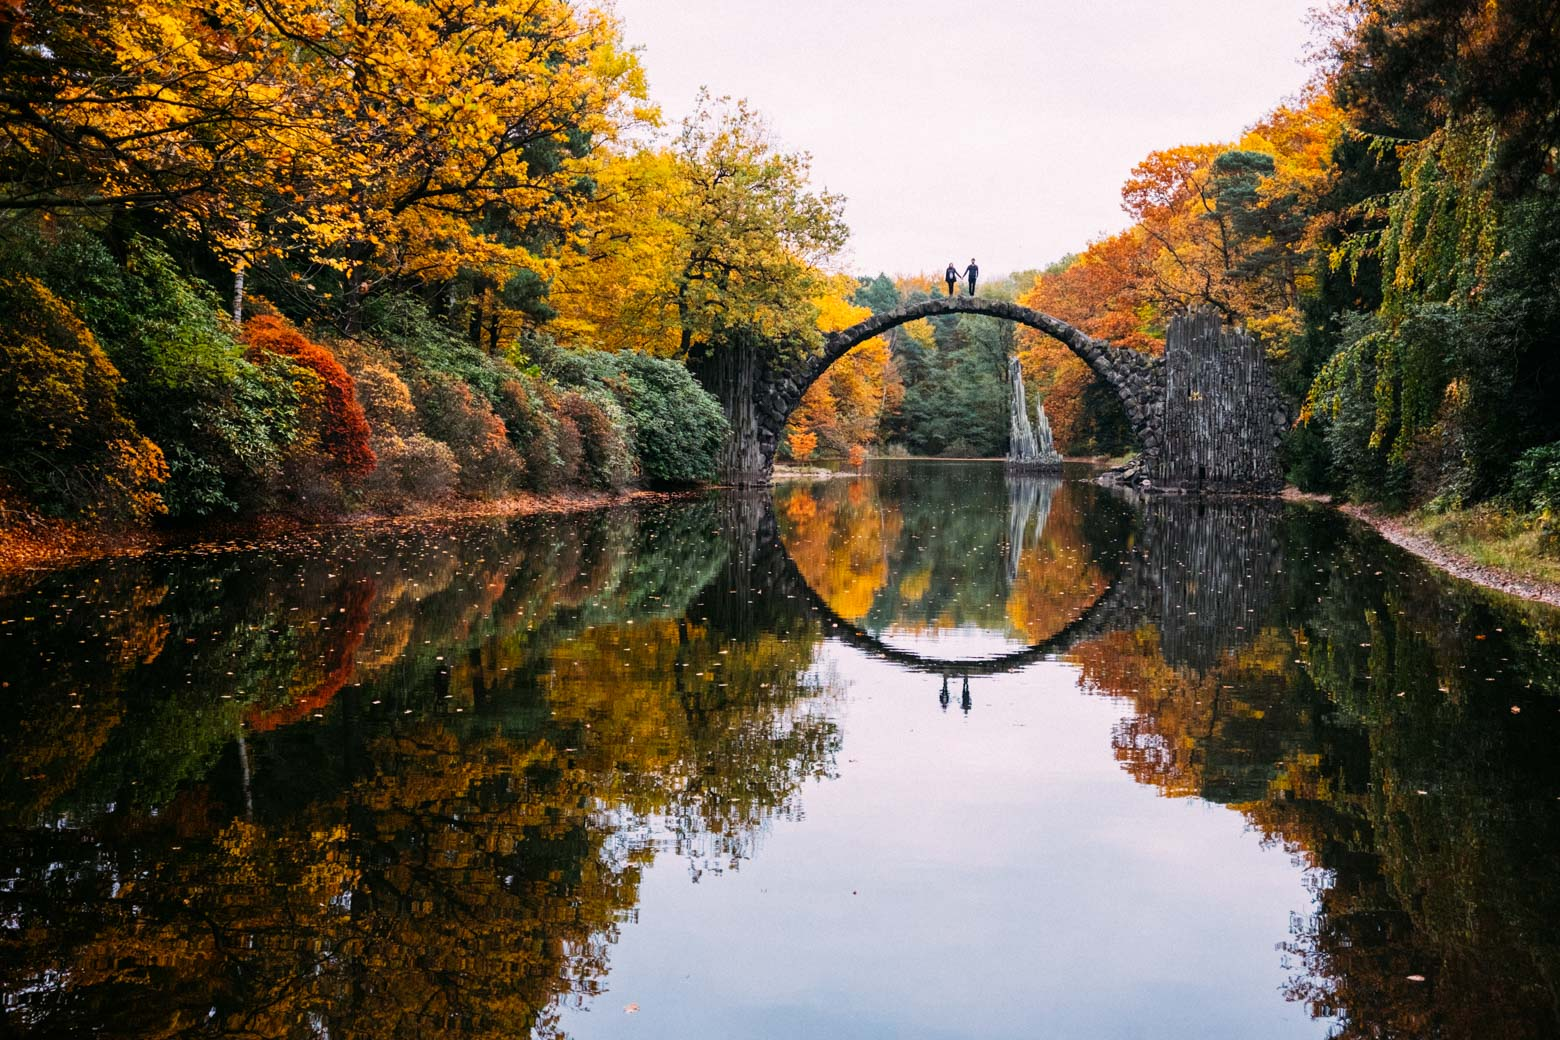 Fall Fairy Wallpaper Crossing The Devil S Bridge In Saxony Not A Nomad Blog